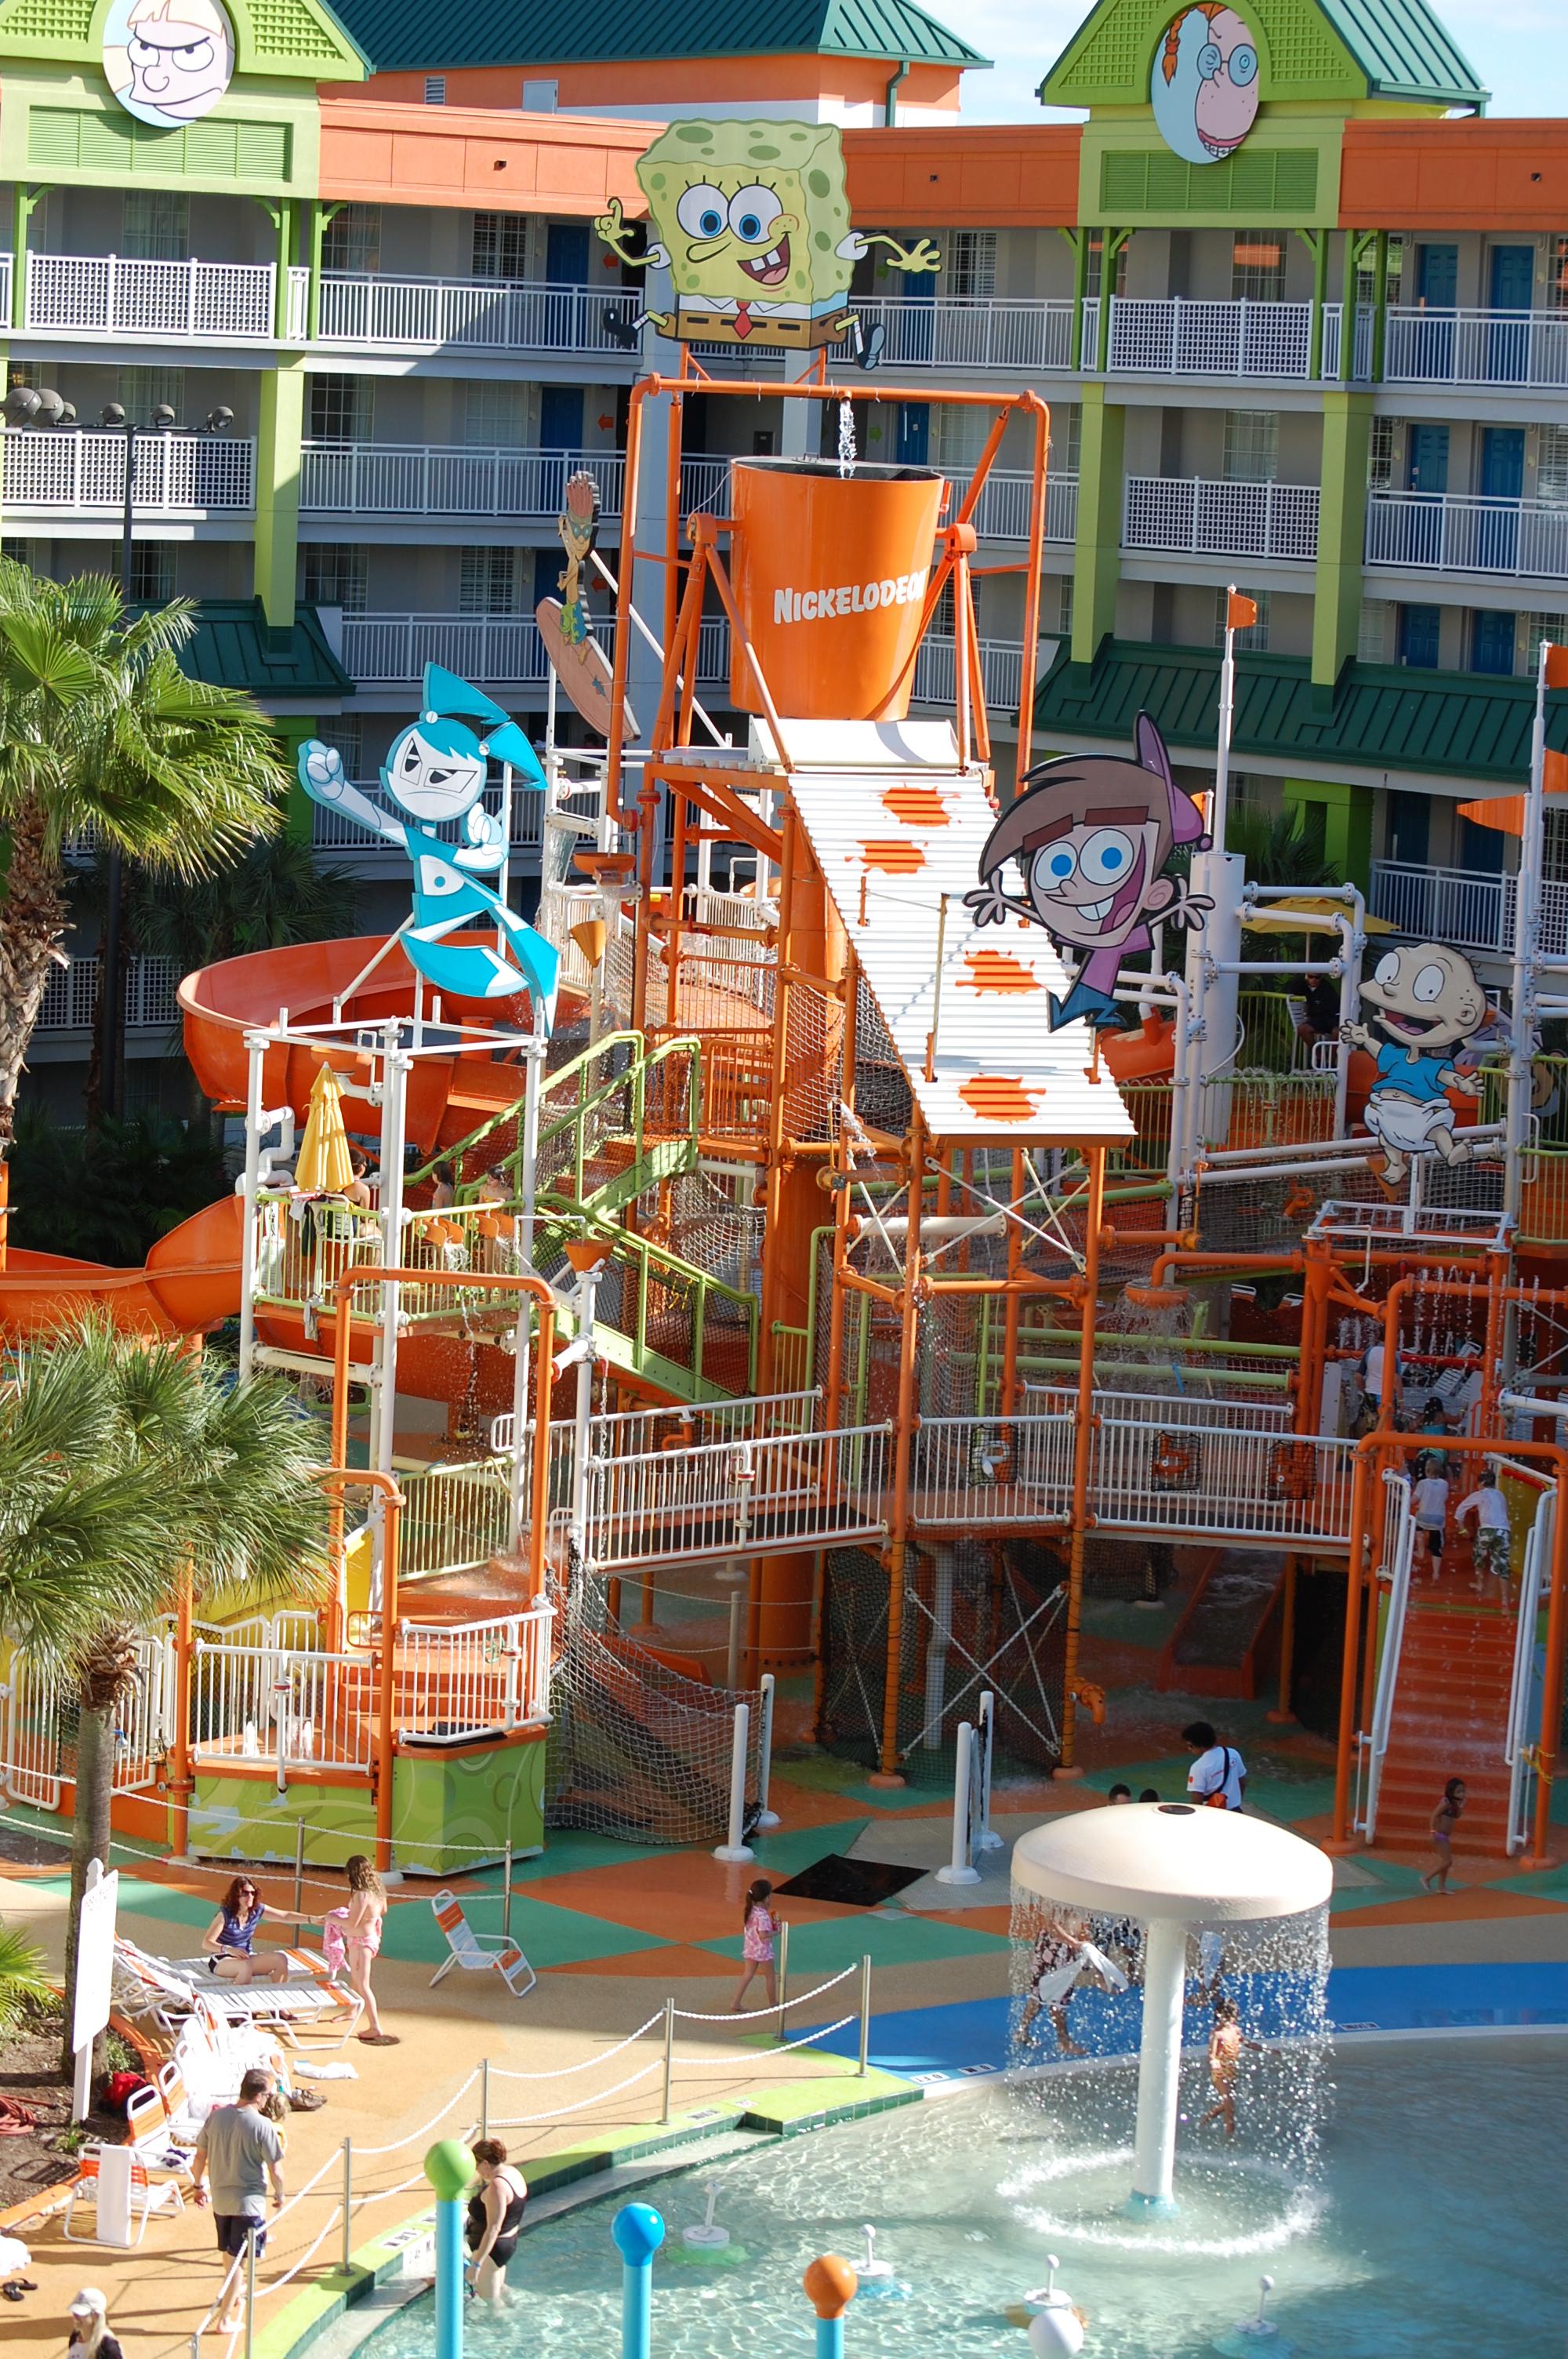 Nickelodeon Resort Orlando Closing : nickelodeon, resort, orlando, closing, Charitybuzz:, Enjoy, 3-Night, Nickelodeon, Family, Suites..., 284207